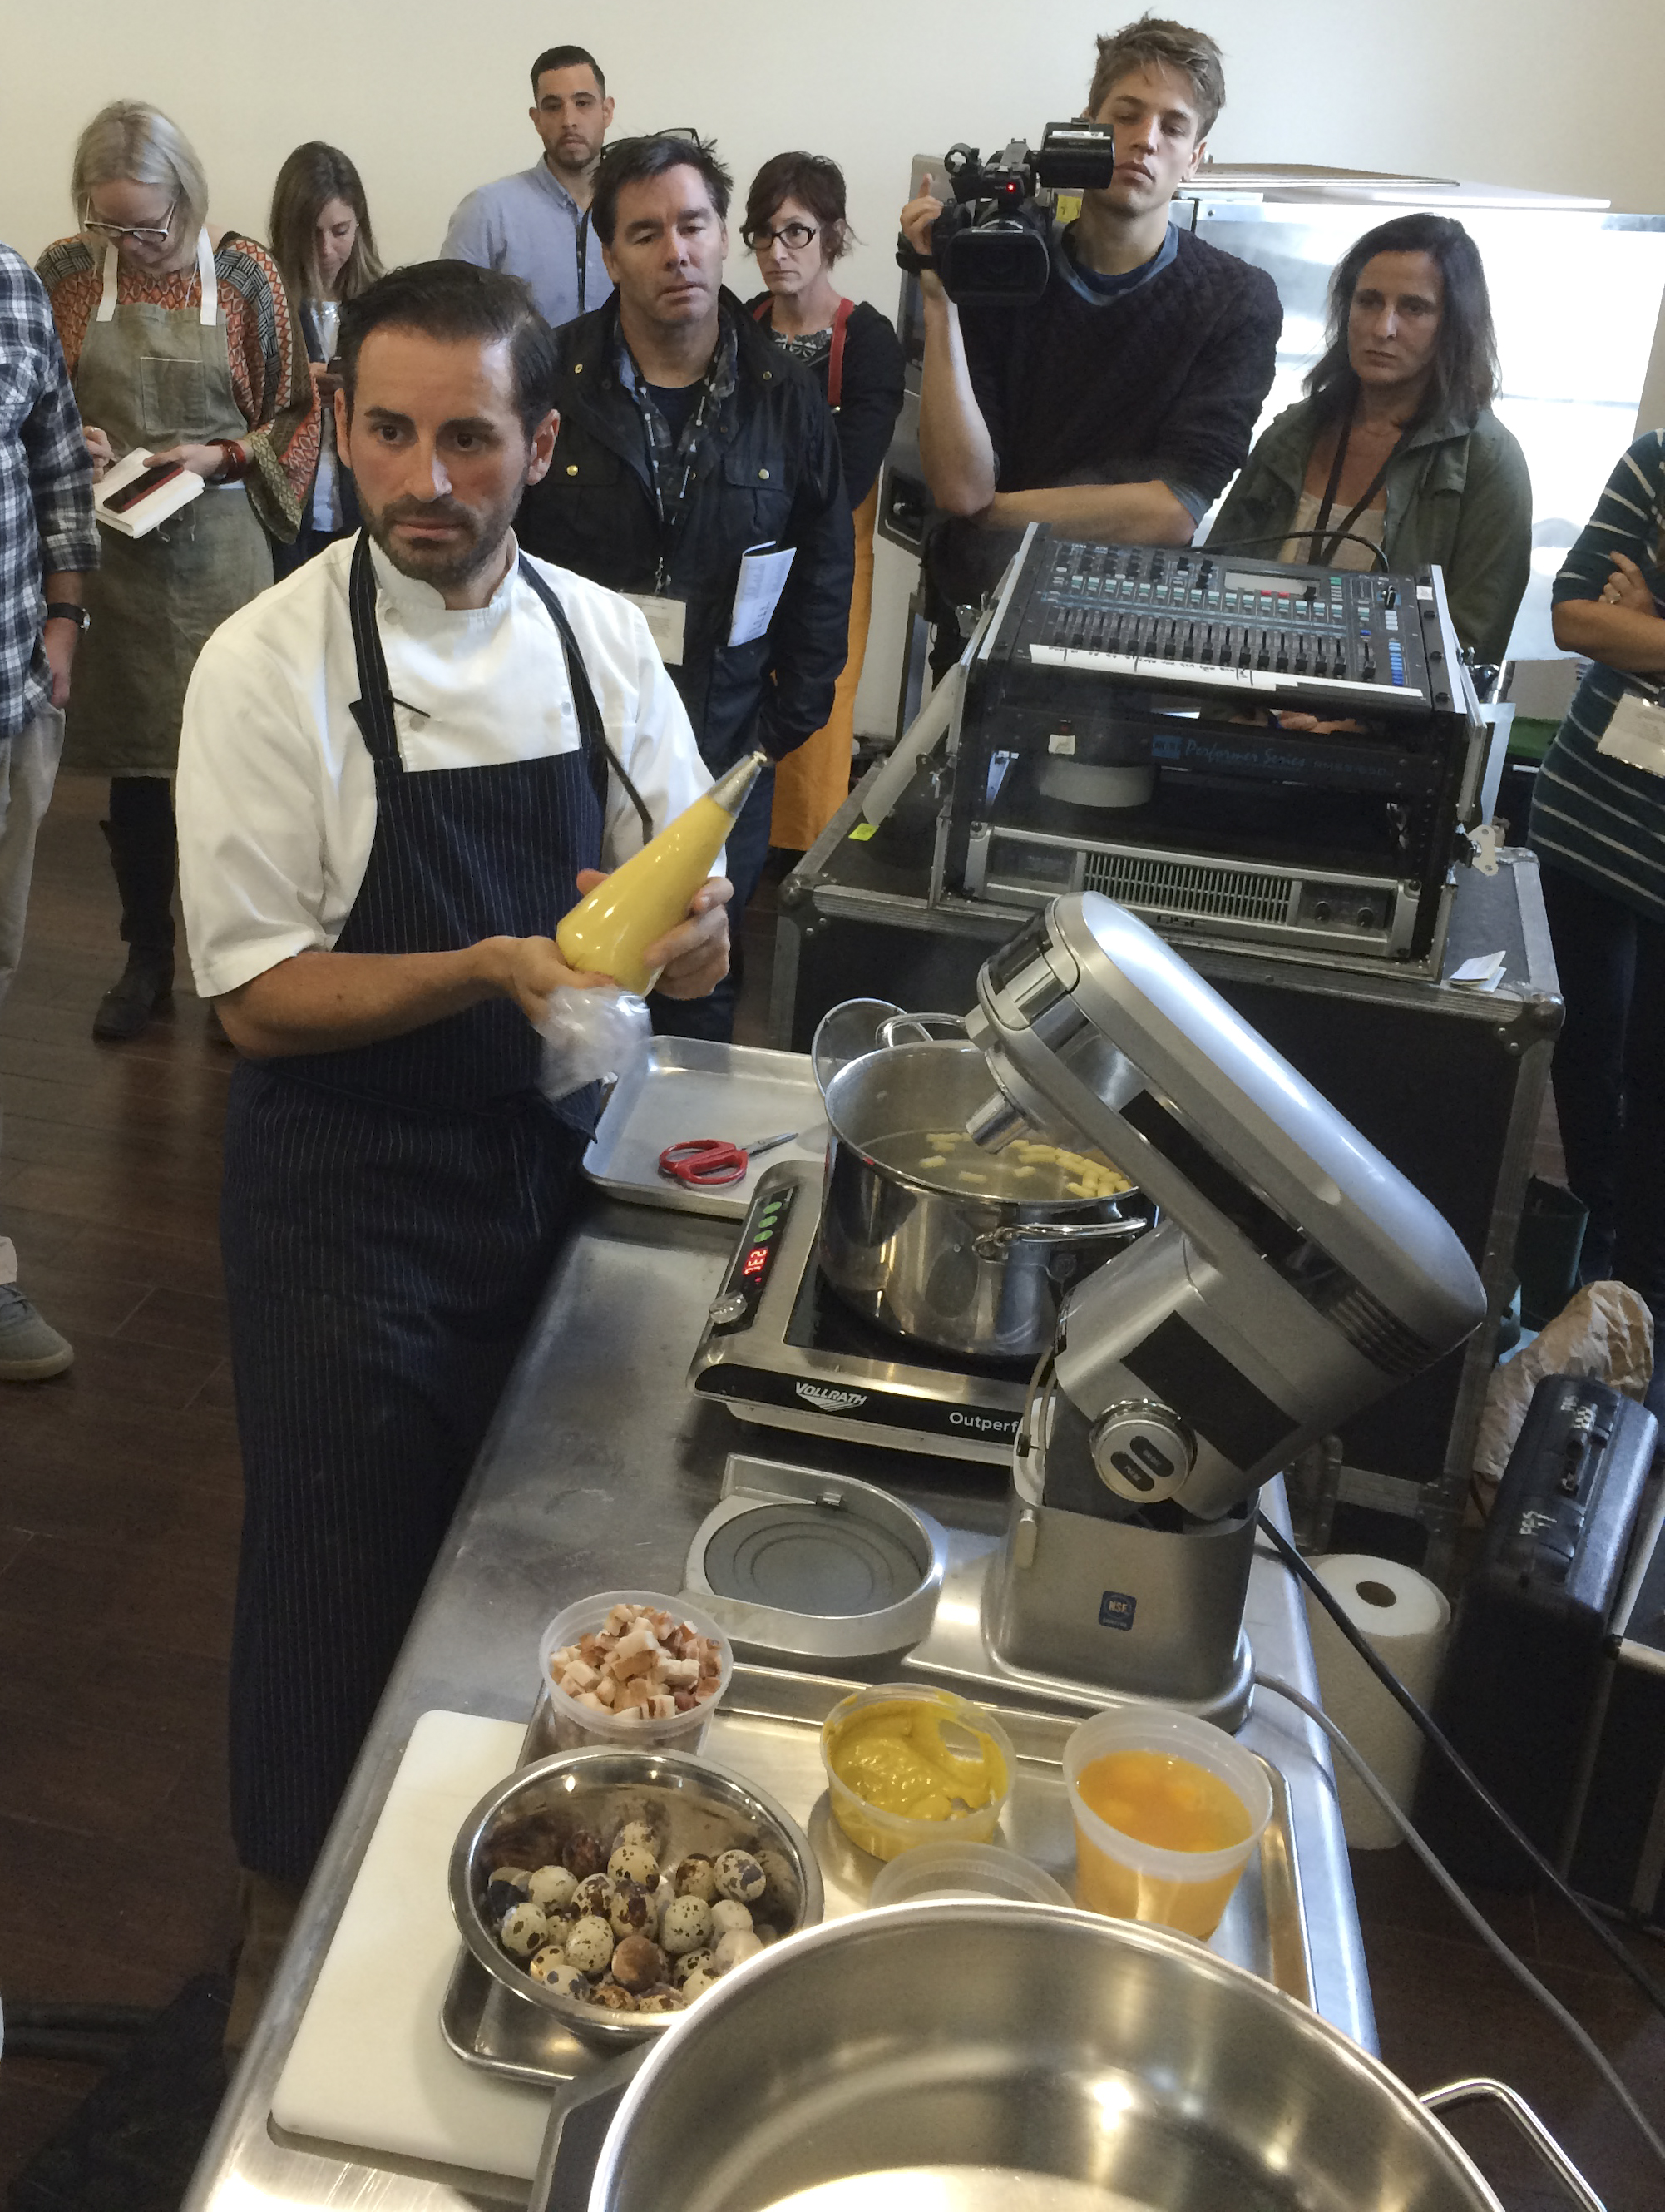 Chef Matt Accarrino at Starchefs ICC 2015